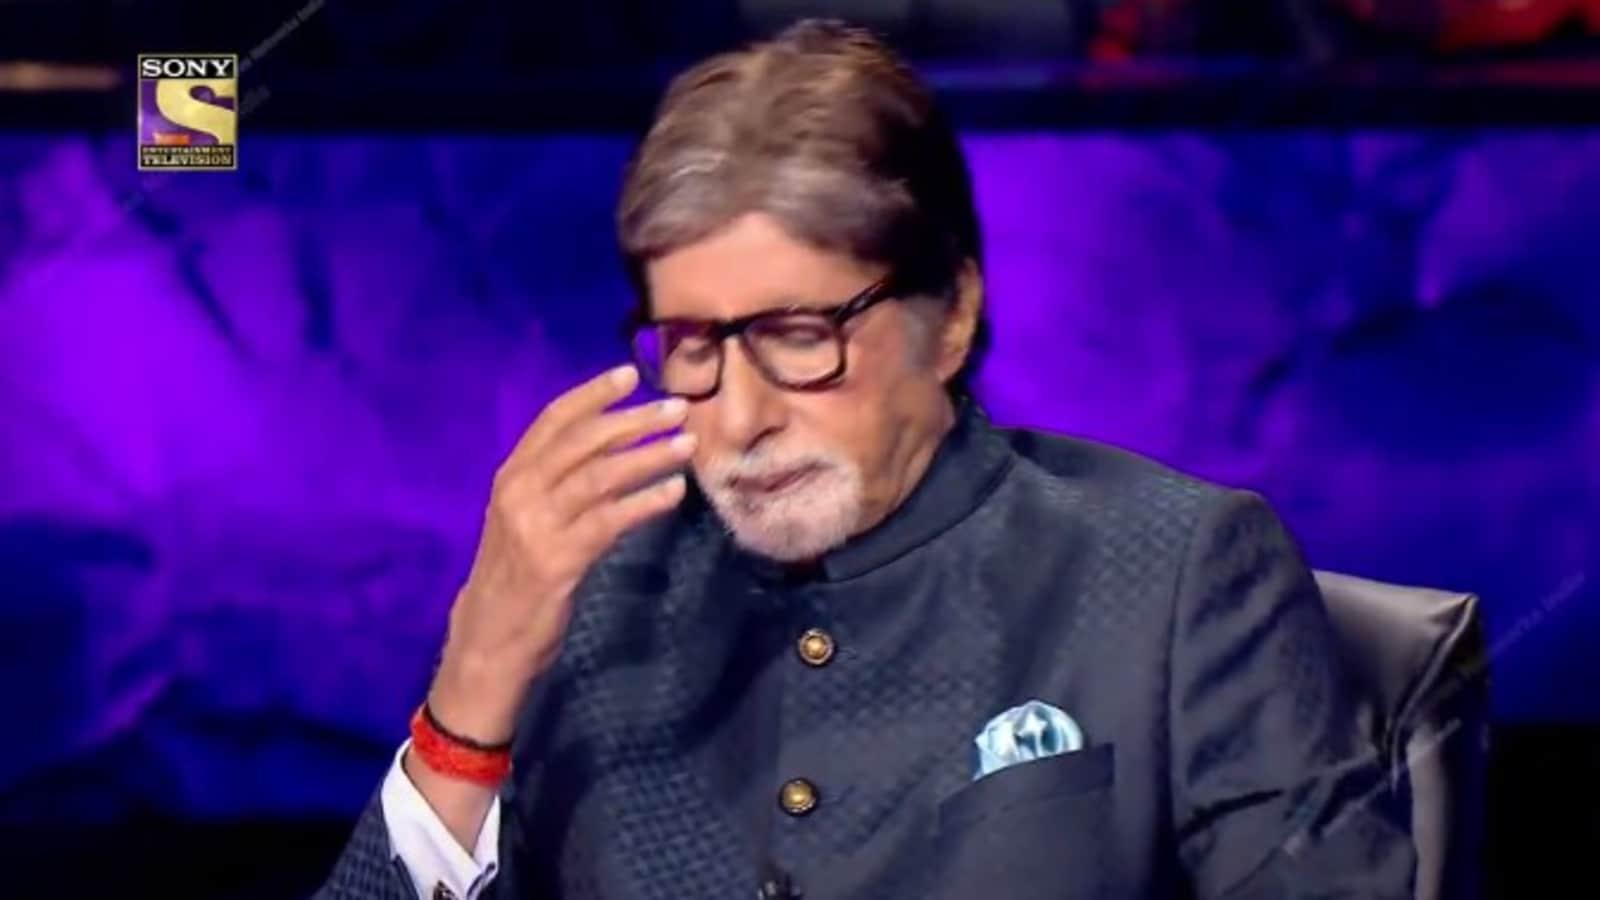 KBC 13: Amitabh Bachchan says 'koi bachayega humko' as contestant won't stop talking about marital problems, watch